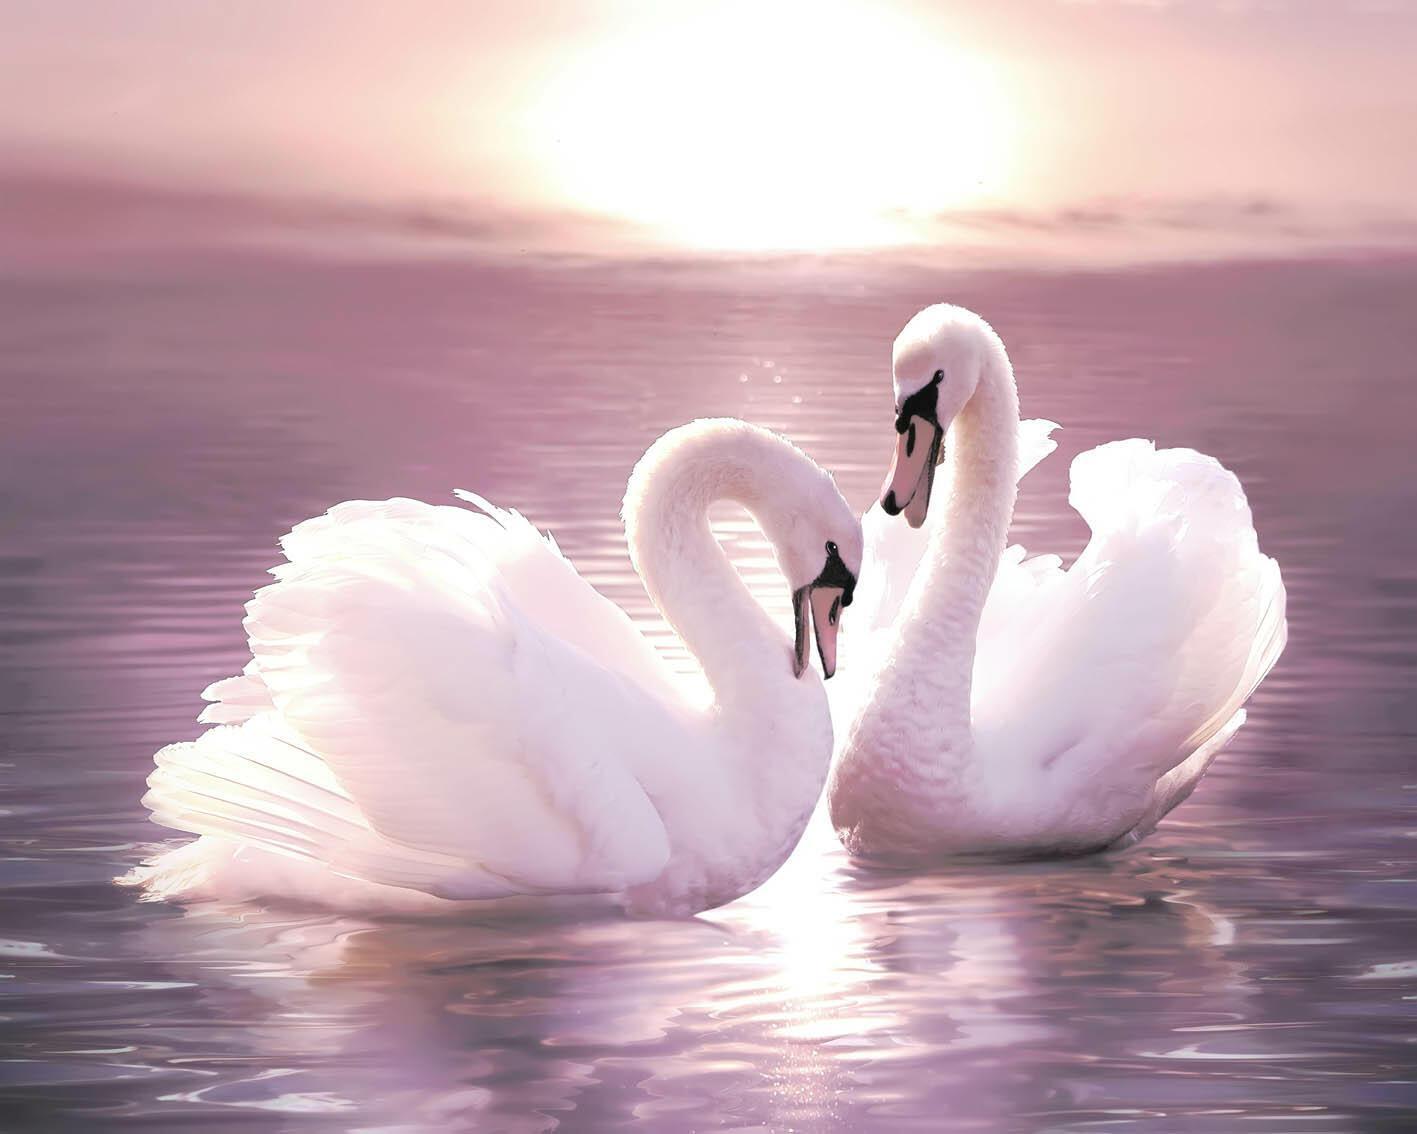 Картинка с лебедями на свадьбу